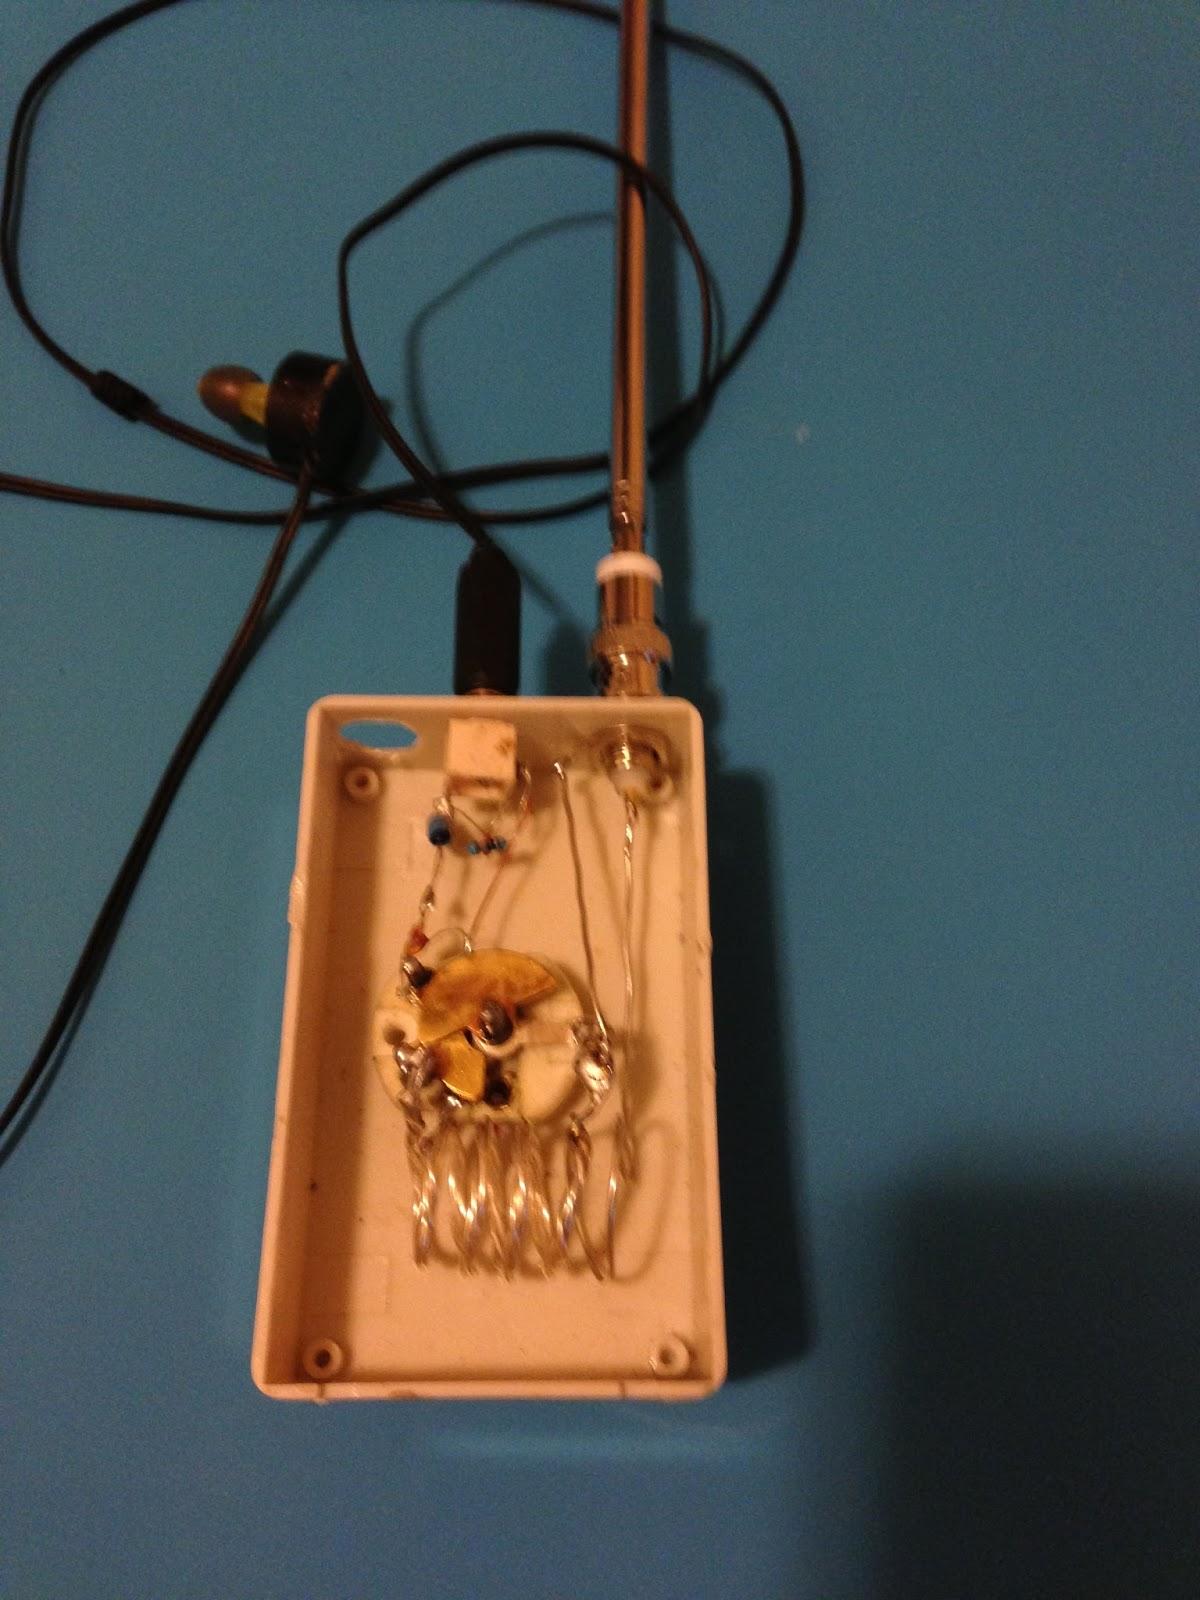 fm crystal radio